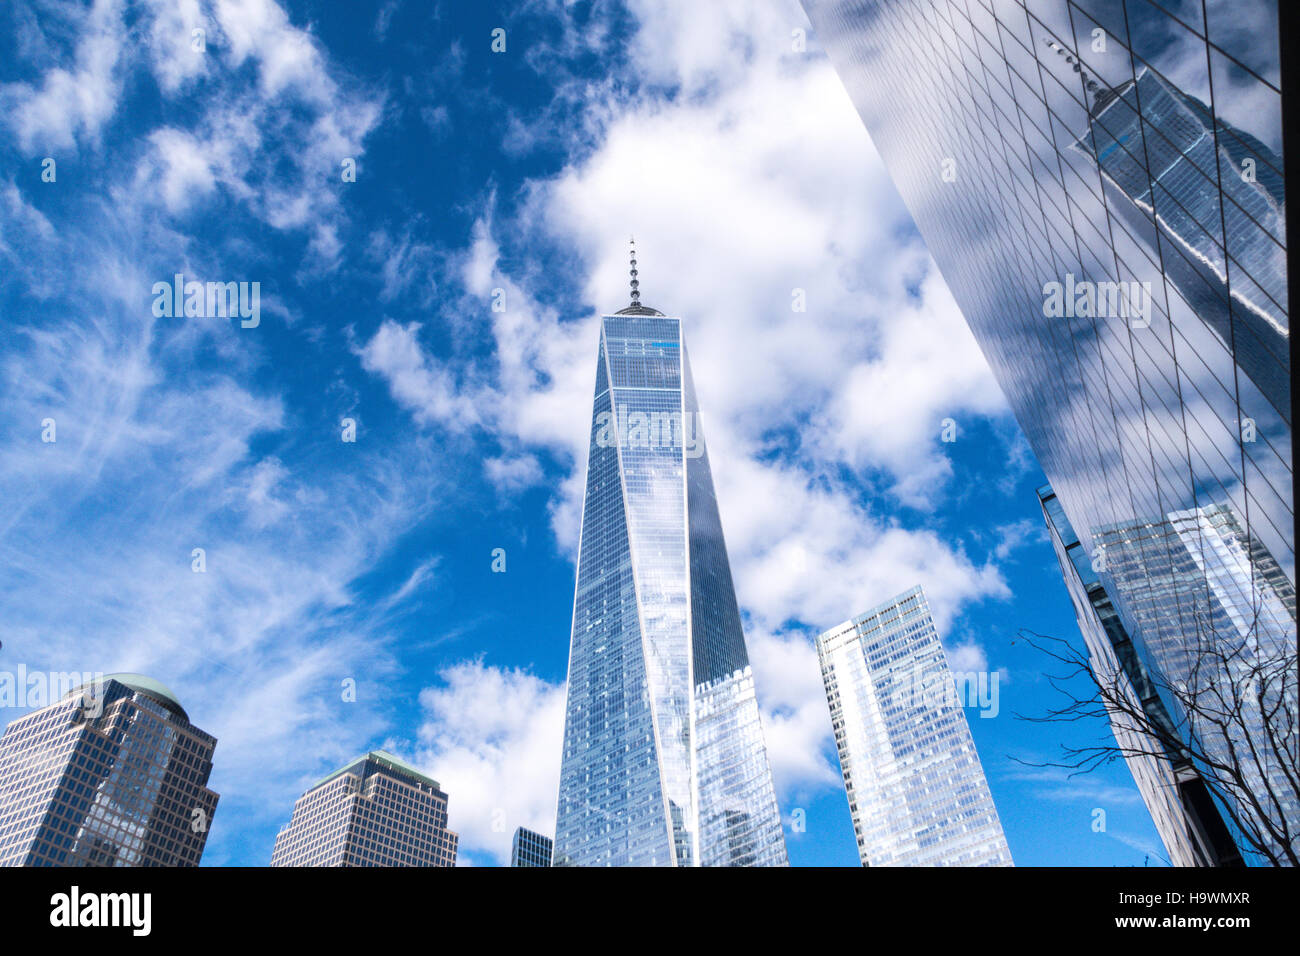 World Trade Center, Manhattan, New York, USA Photo Stock